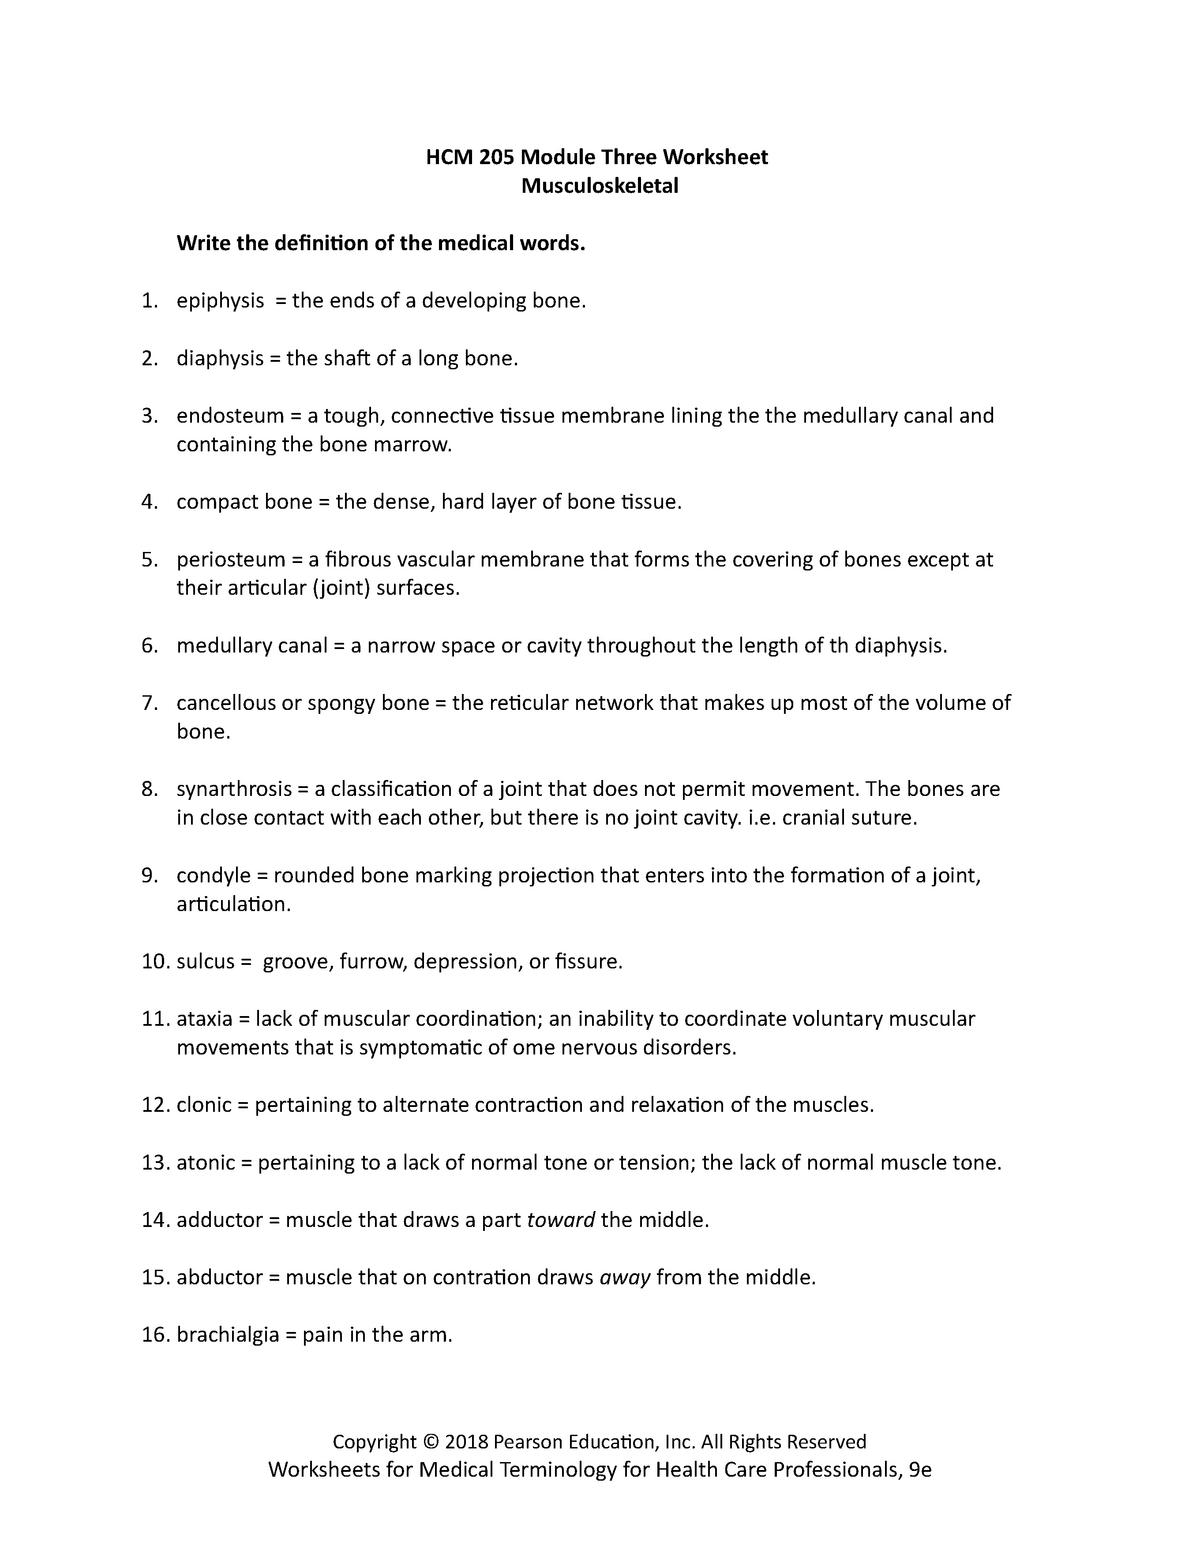 HCM 205 Module Three Worksheet - HCM205 Medical Terminology